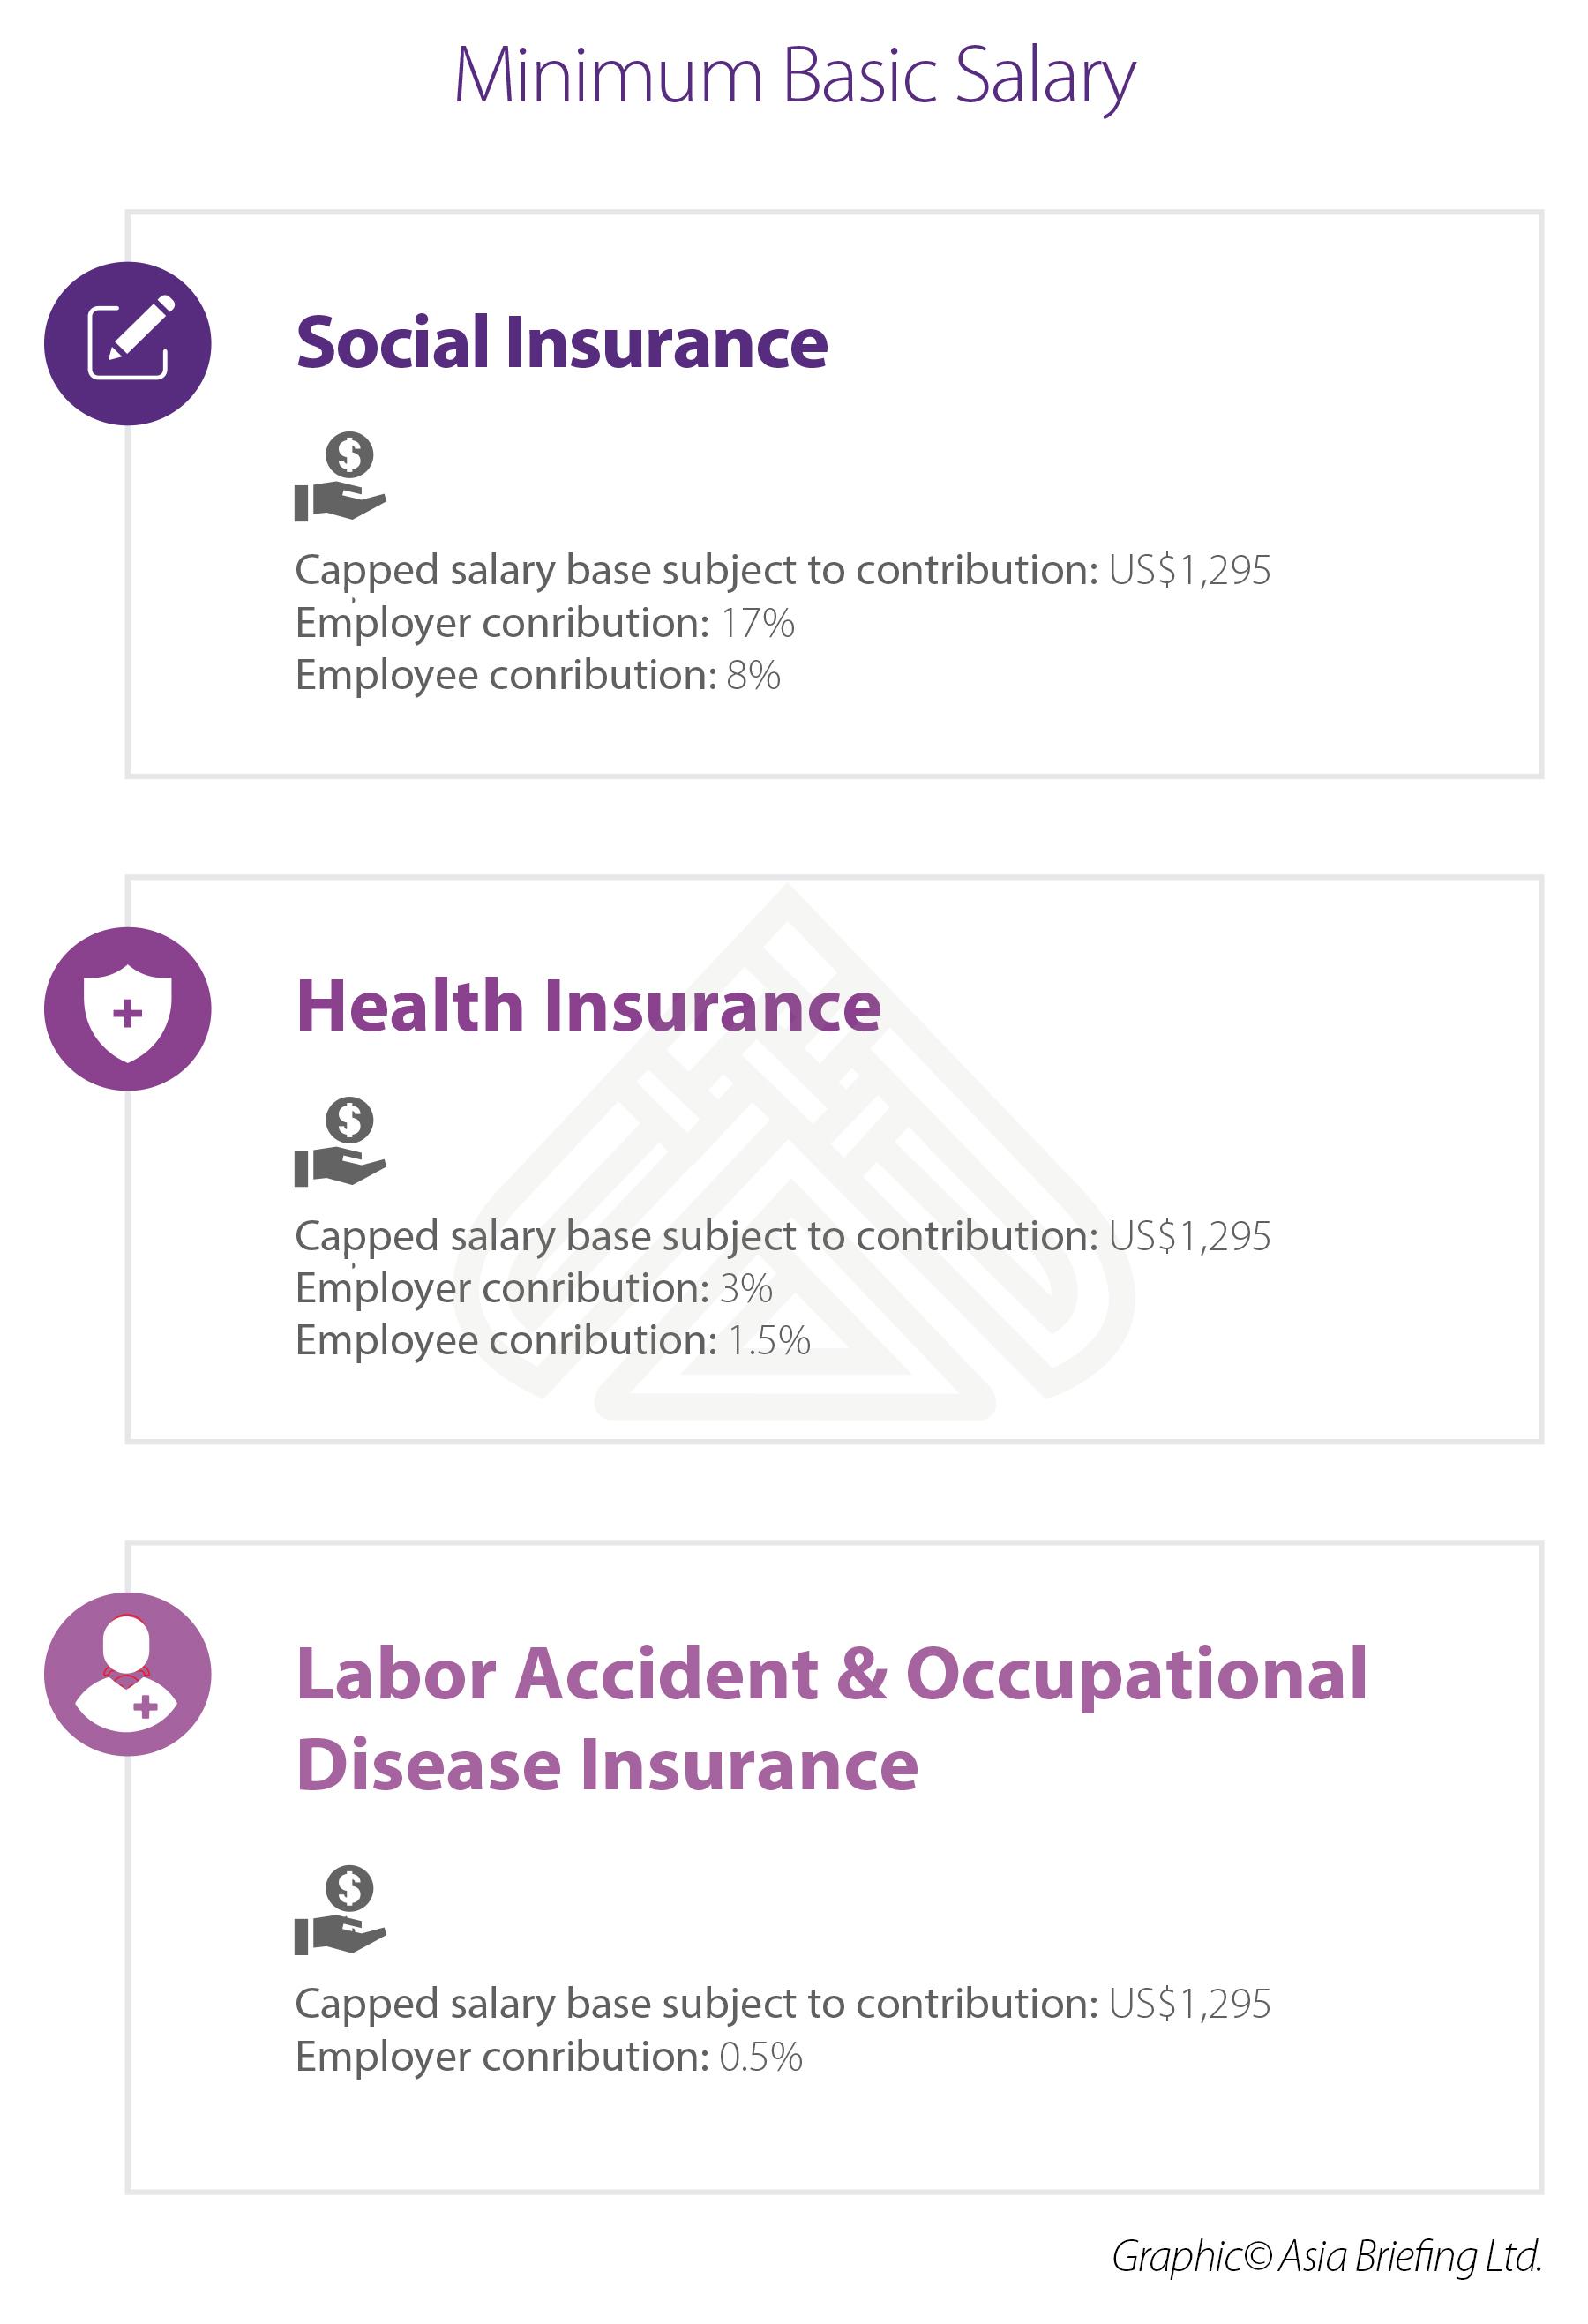 New Minimum Basic Salary, Social Insurance Rates in Vietnam